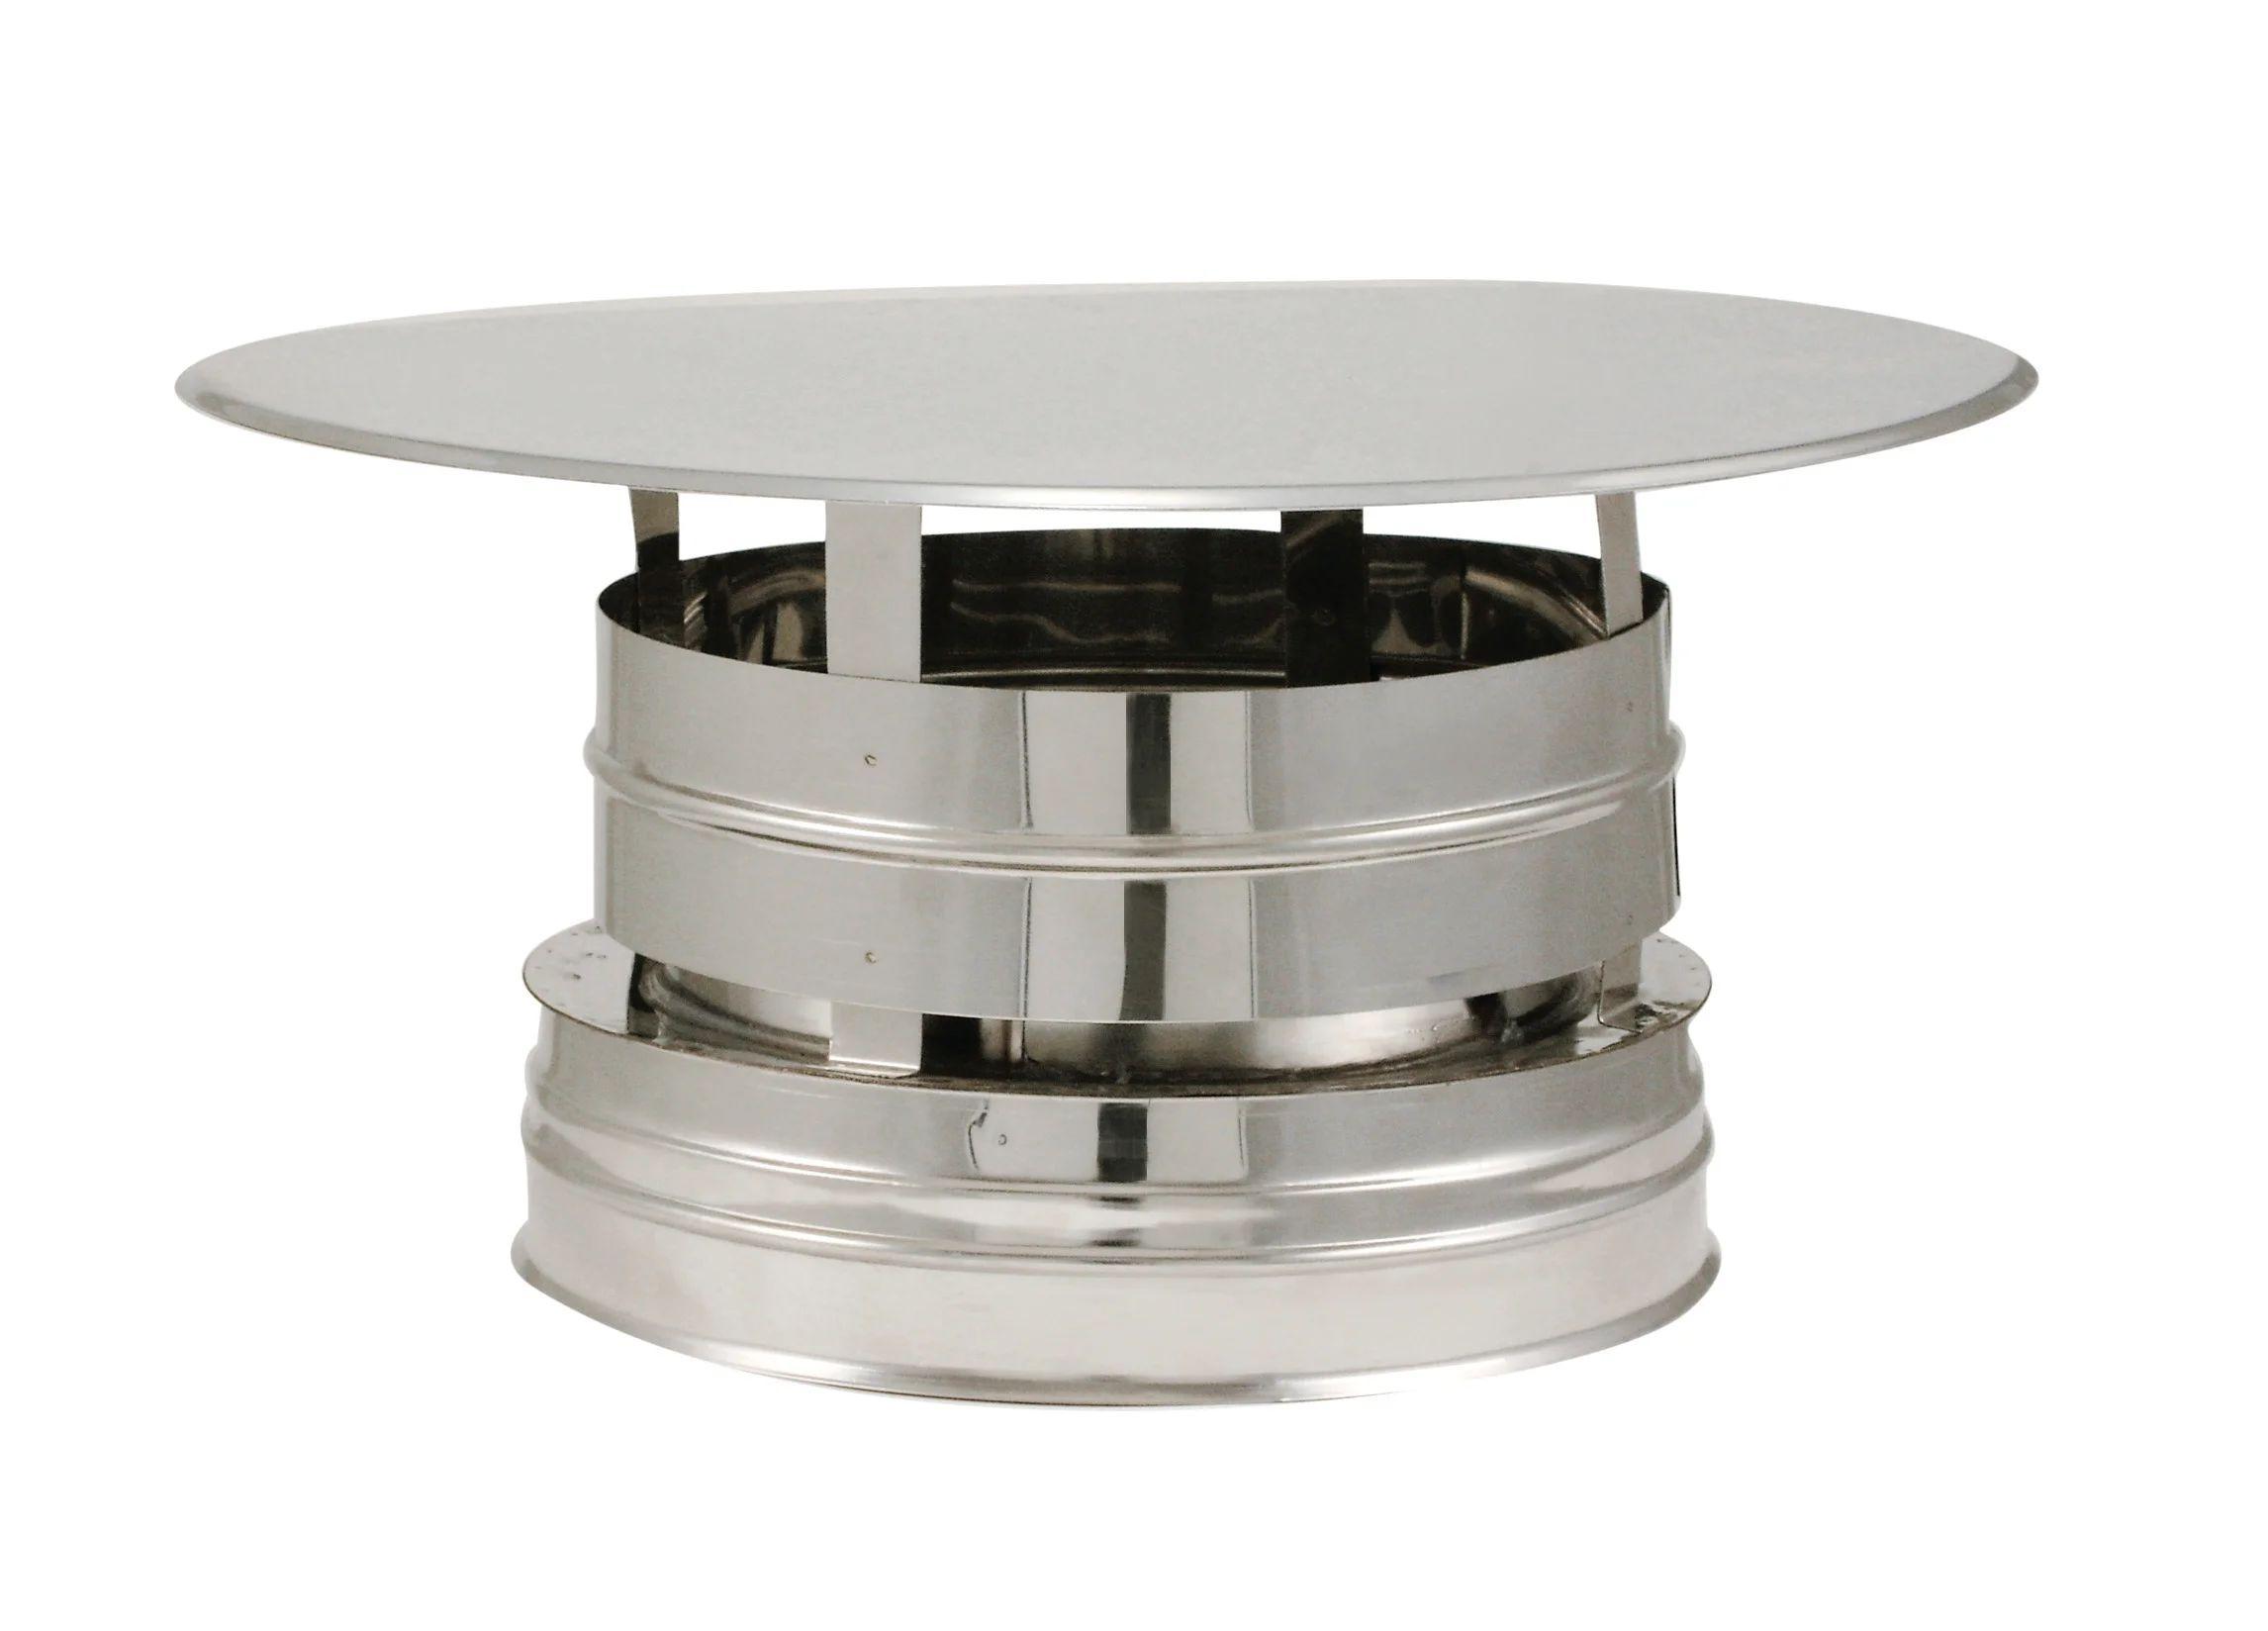 Chapeau Aspirateur Isotip Joncoux 200 Mm Leroy Merlin